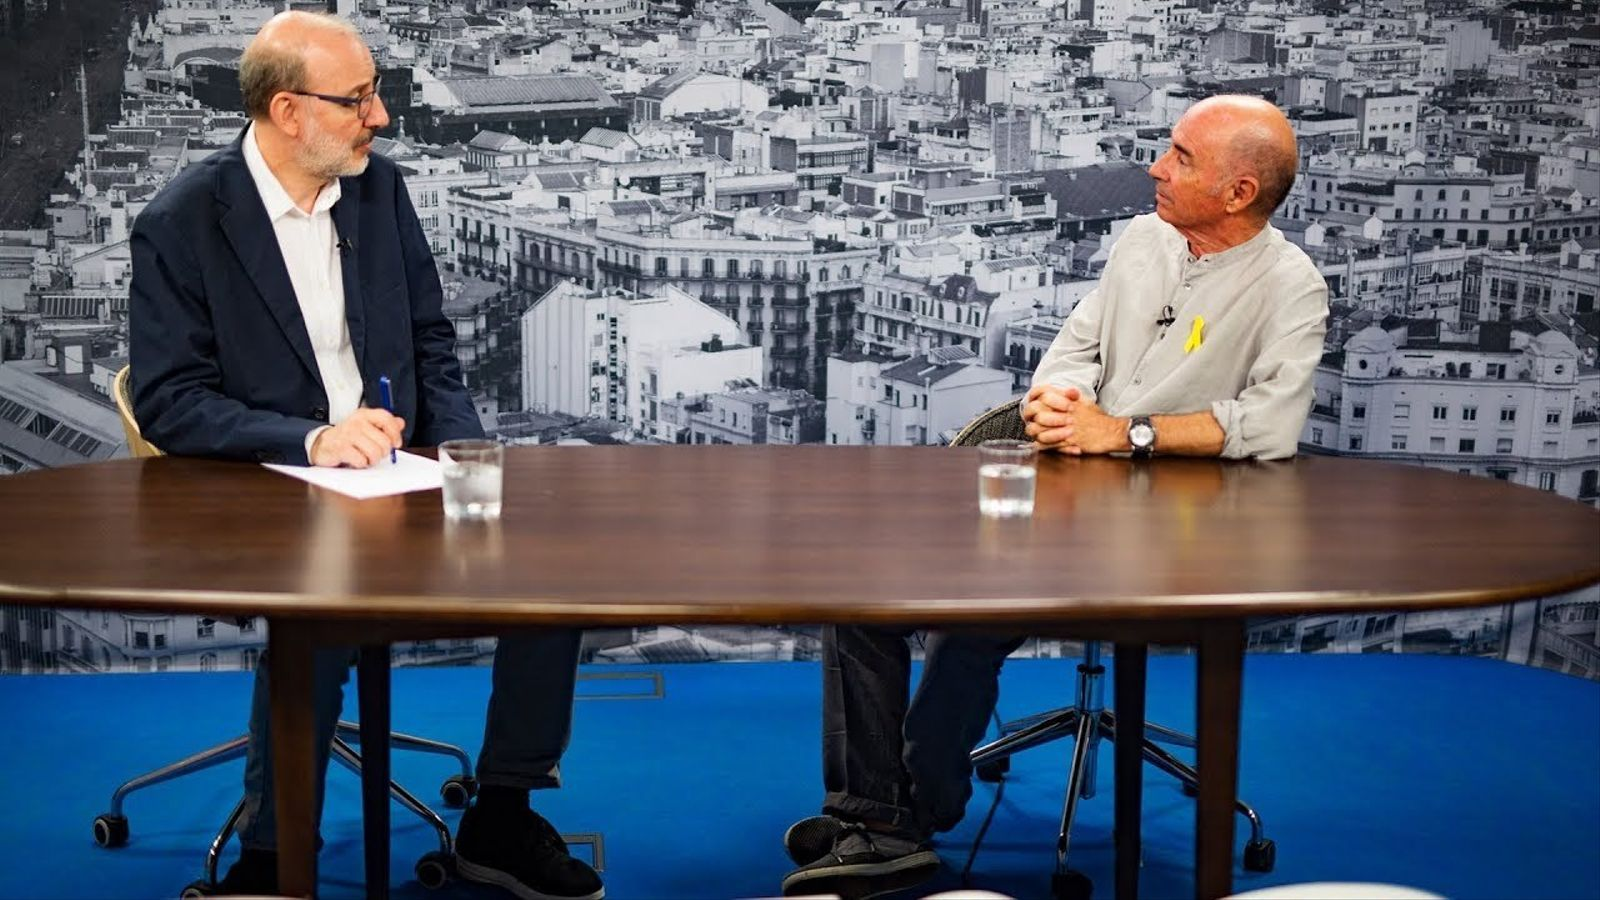 Entrevista d'Antoni Bassas a Lluís Llach